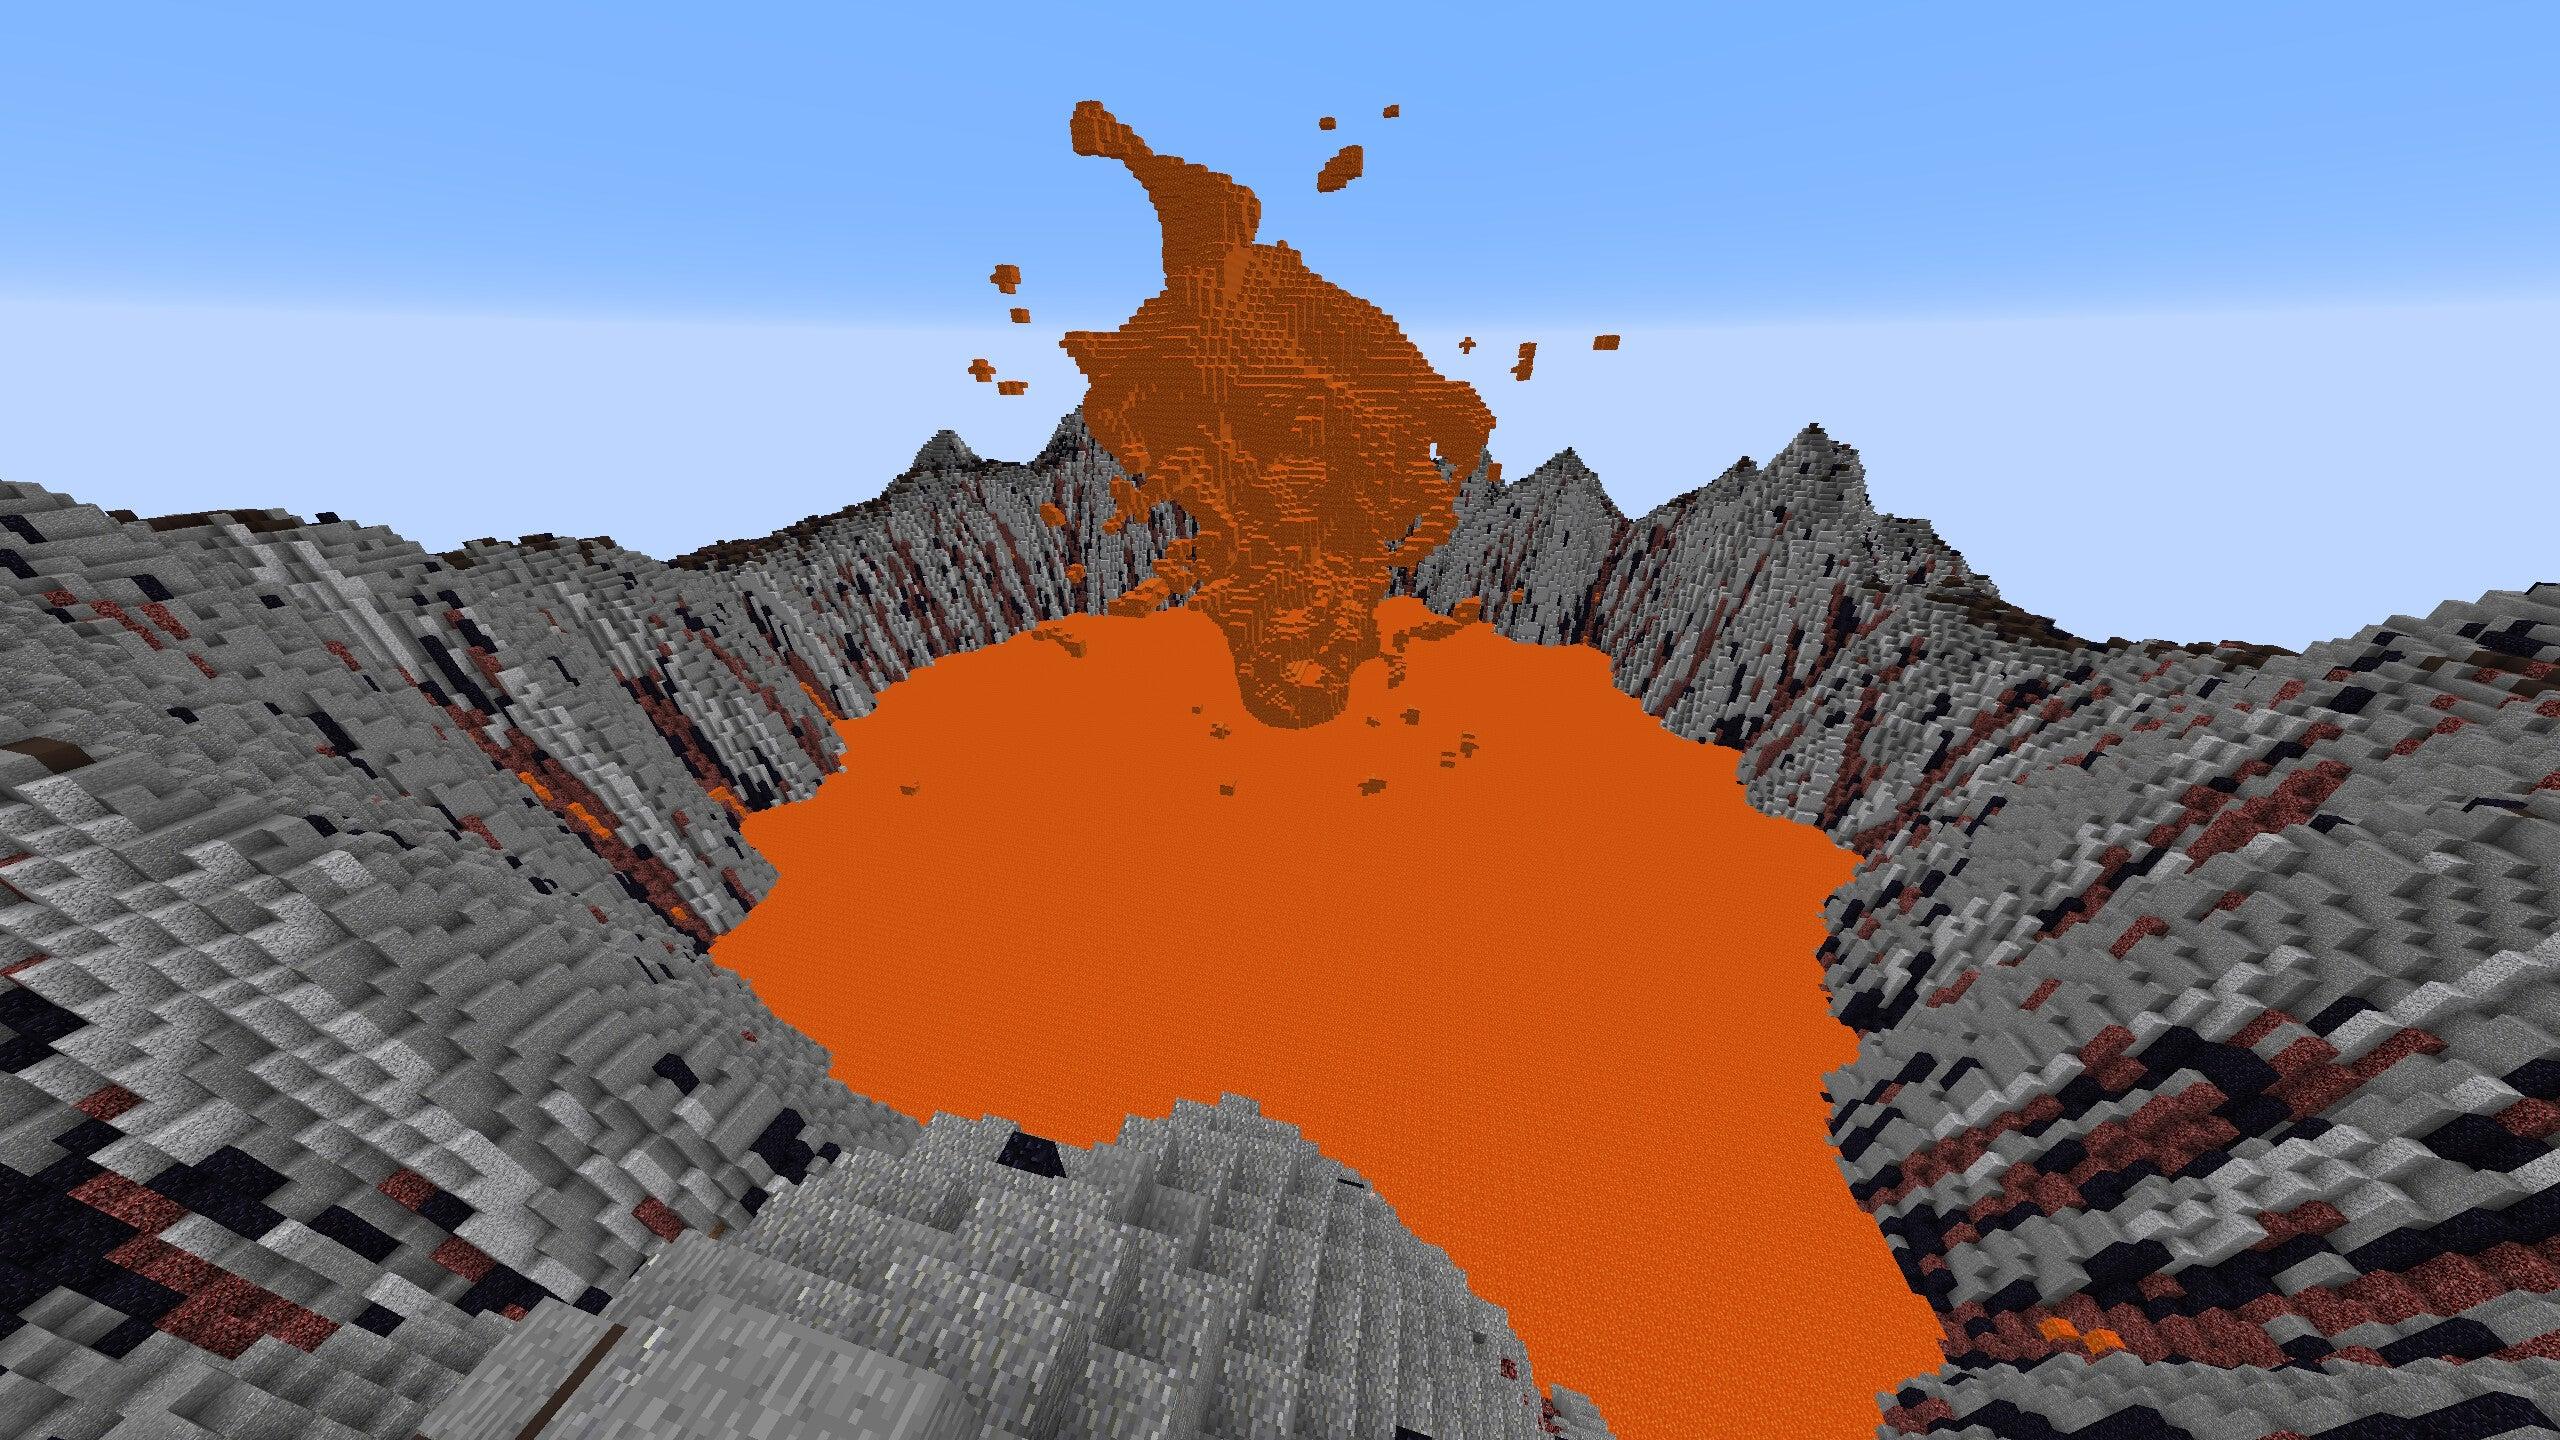 yellowstone volcano eruption map with Minecraft Map Is Basically 36 Square Kilometres Of Primal Beauty on Gran Fuente Prismatica En El Parque Yellowstone together with Fs027 00 as well Minecraft Map Is Basically 36 Square Kilometres Of Primal Beauty further Volcanos together with Fs100 03.